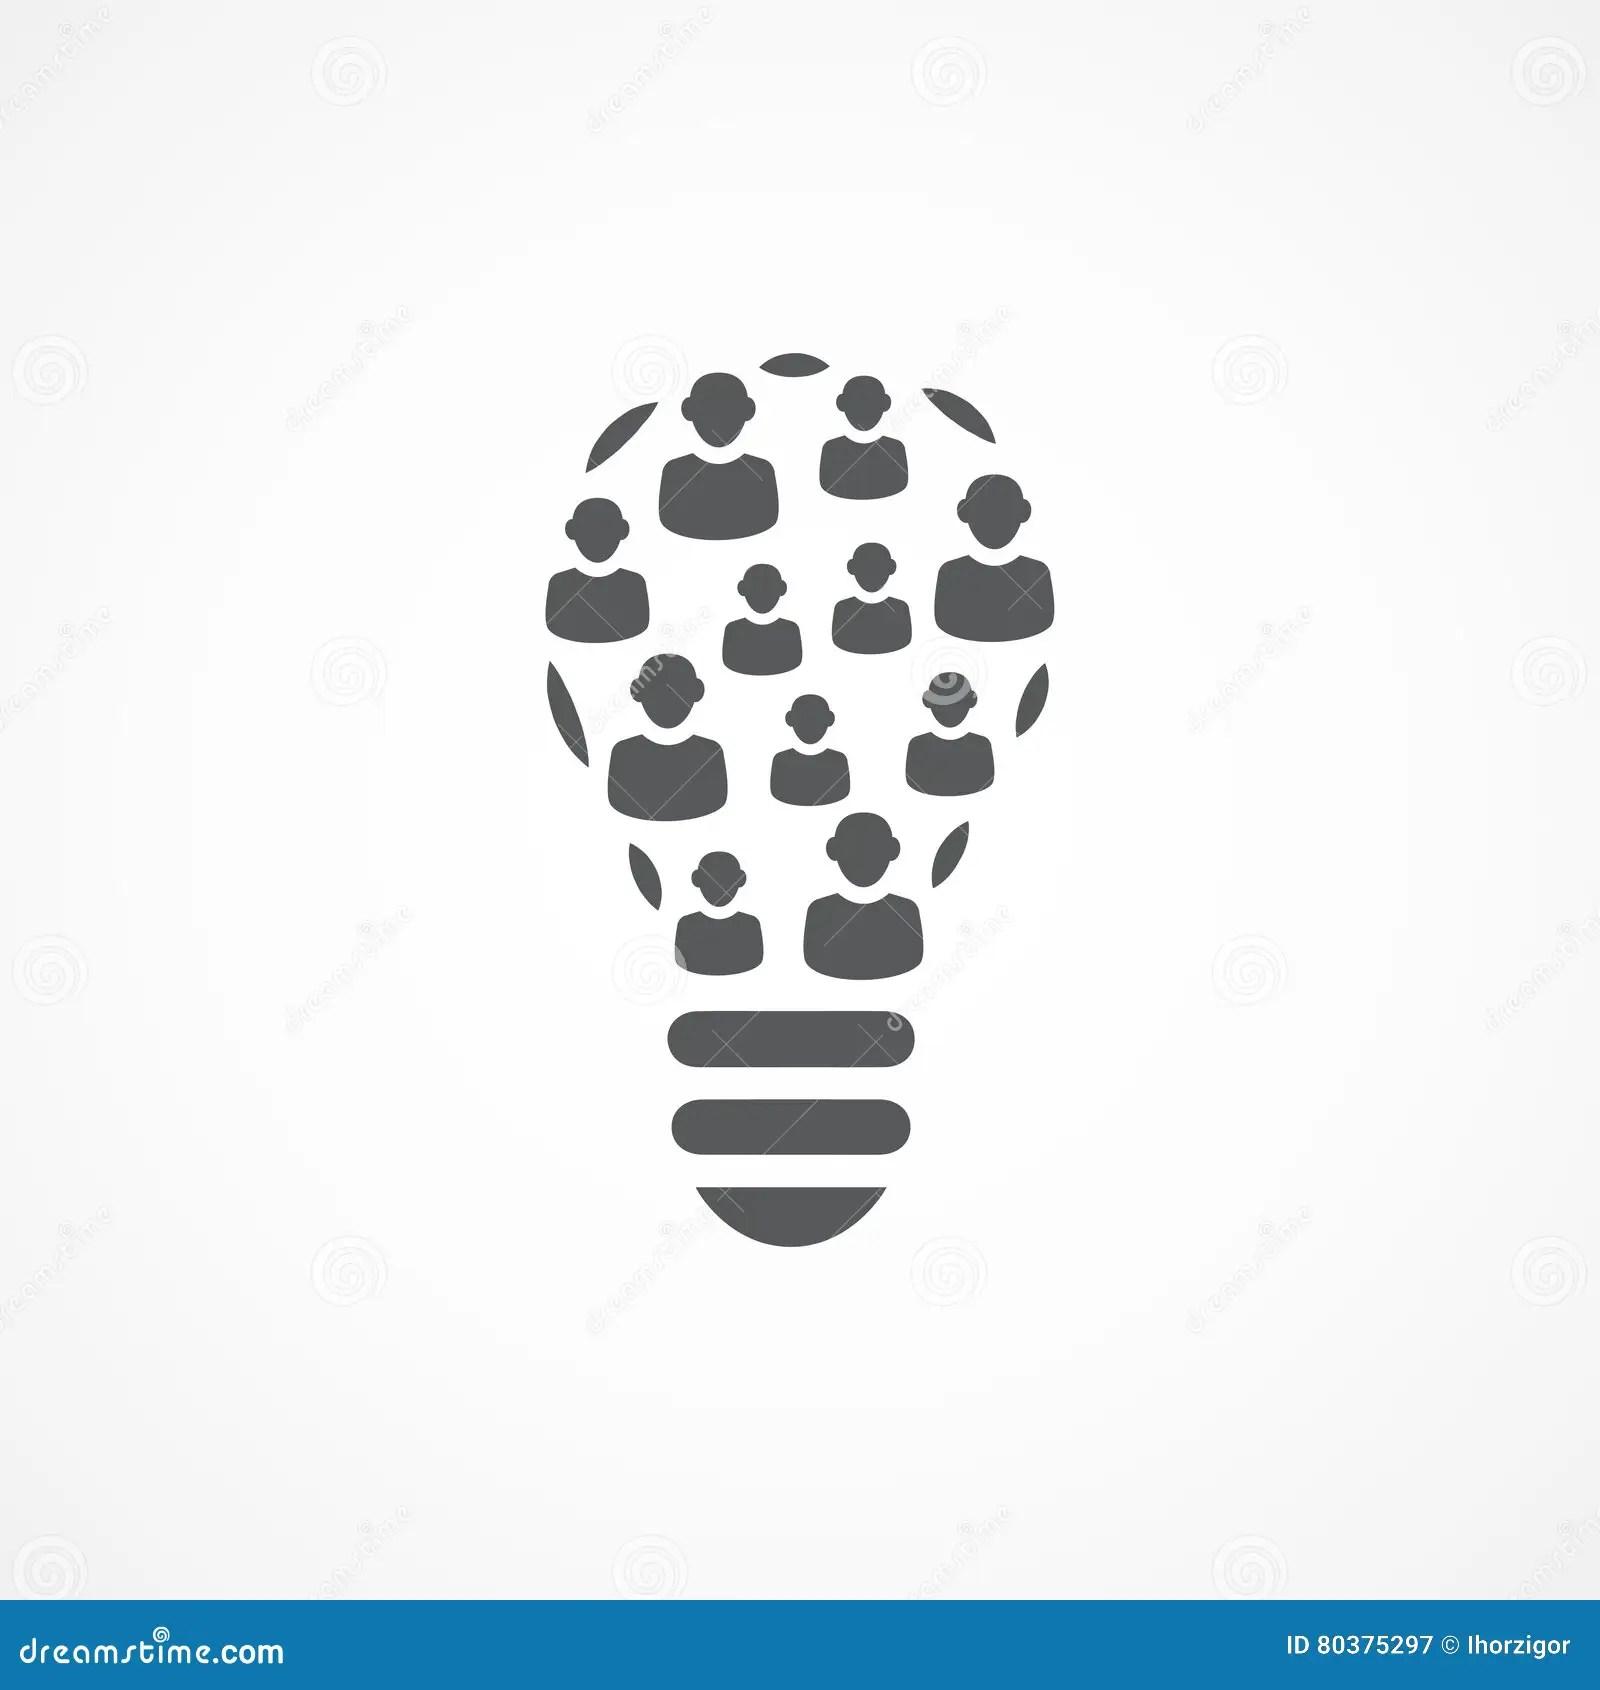 Creativity Network Crowdsourcing Vector Illustration